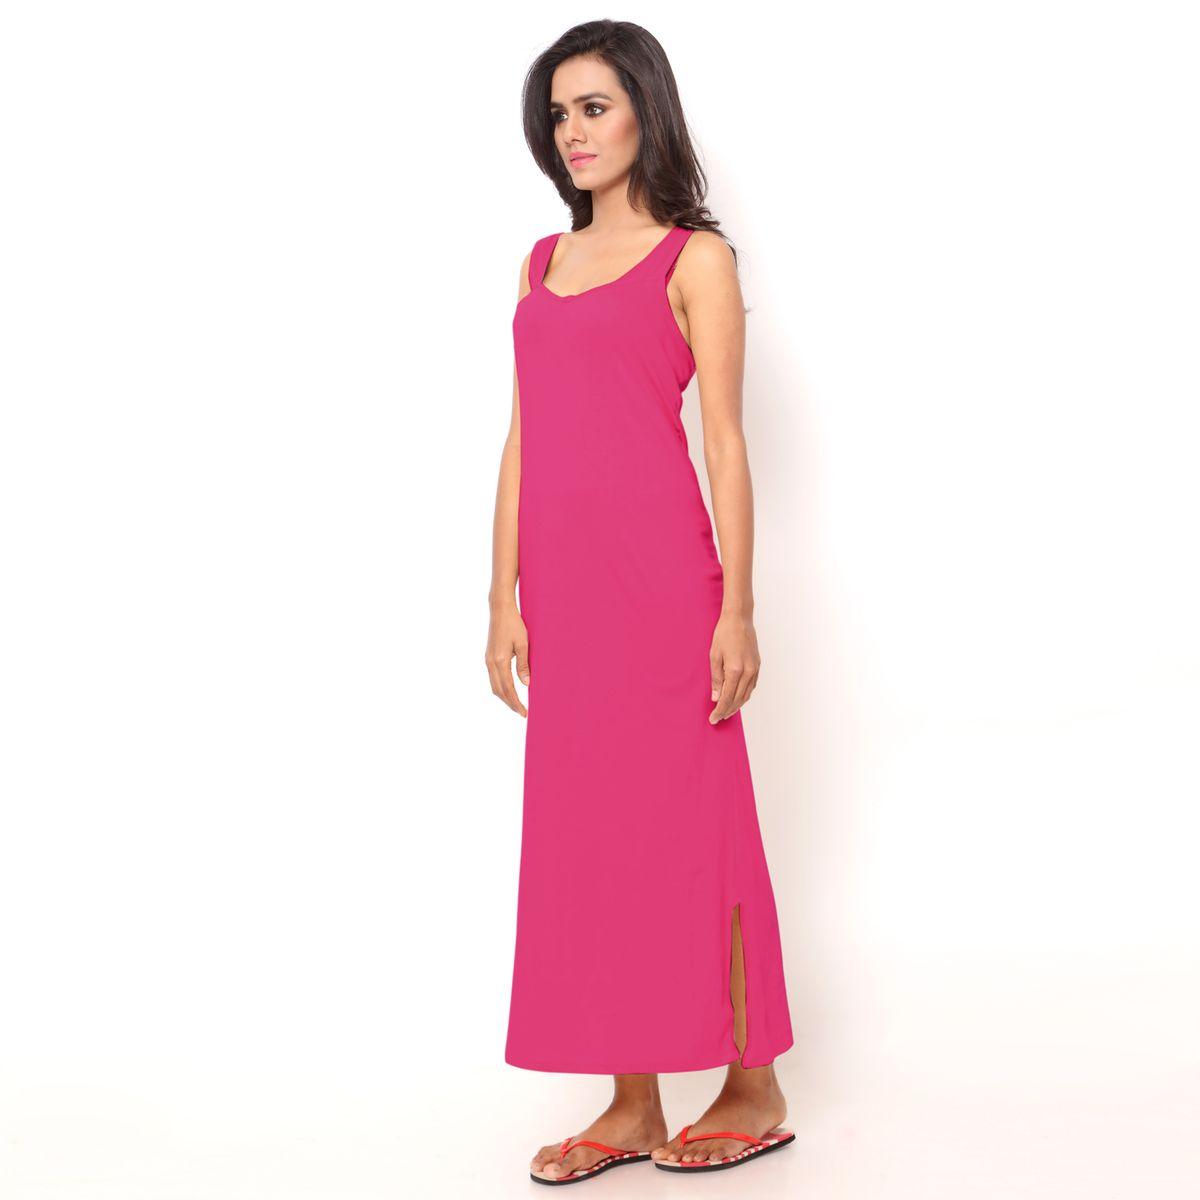 ... release date da26d 1dc9b Ziya Pure Cotton Dark Pink Sleeveless Nighty  Pack Of 3 ... e0da80640